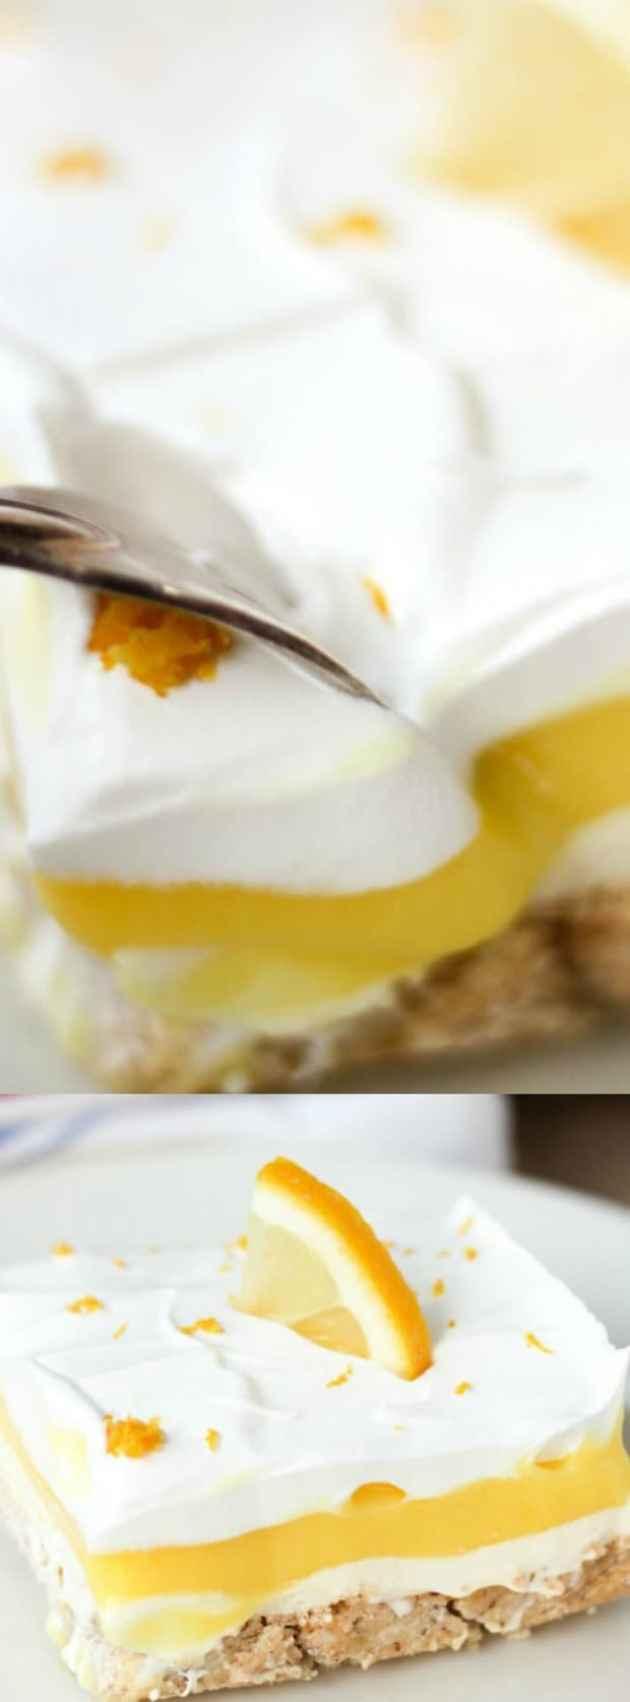 Lemon Lush Longpin